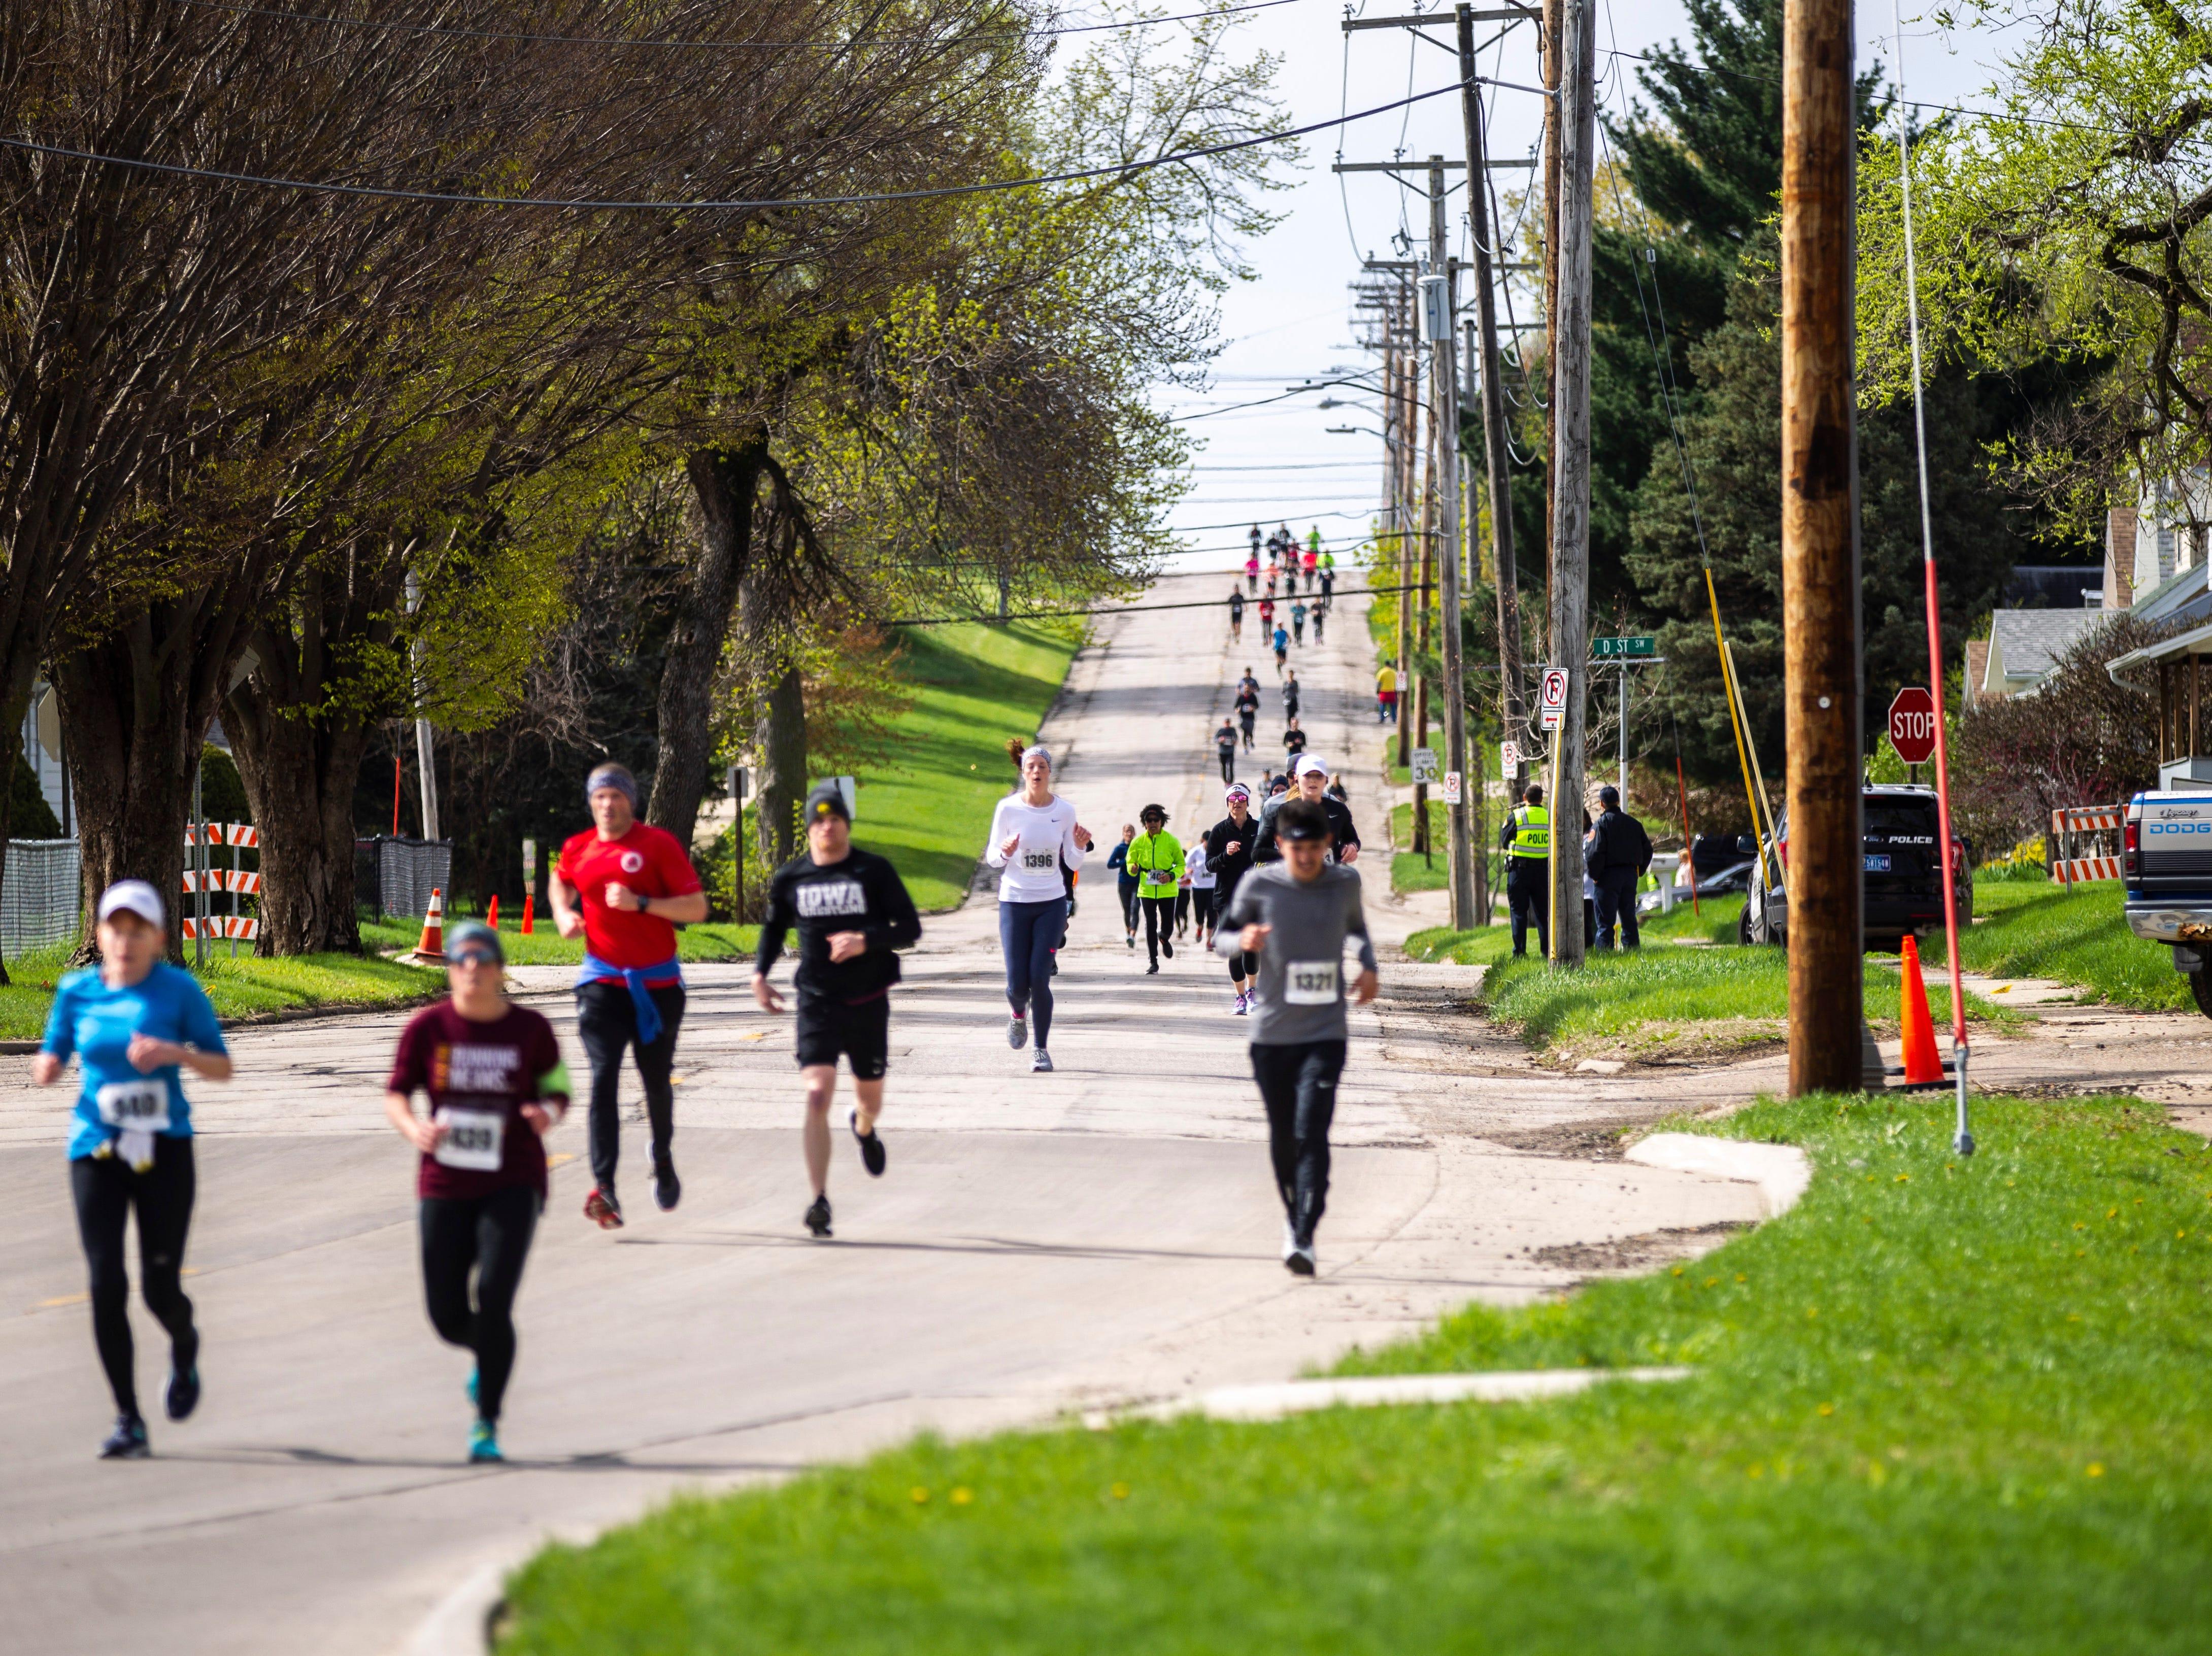 Runners near the 26 mile mark during the second annual Run CRANDIC marathon, Sunday, April 28, 2019, along Bowling Street SW in Cedar Rapids, Iowa.